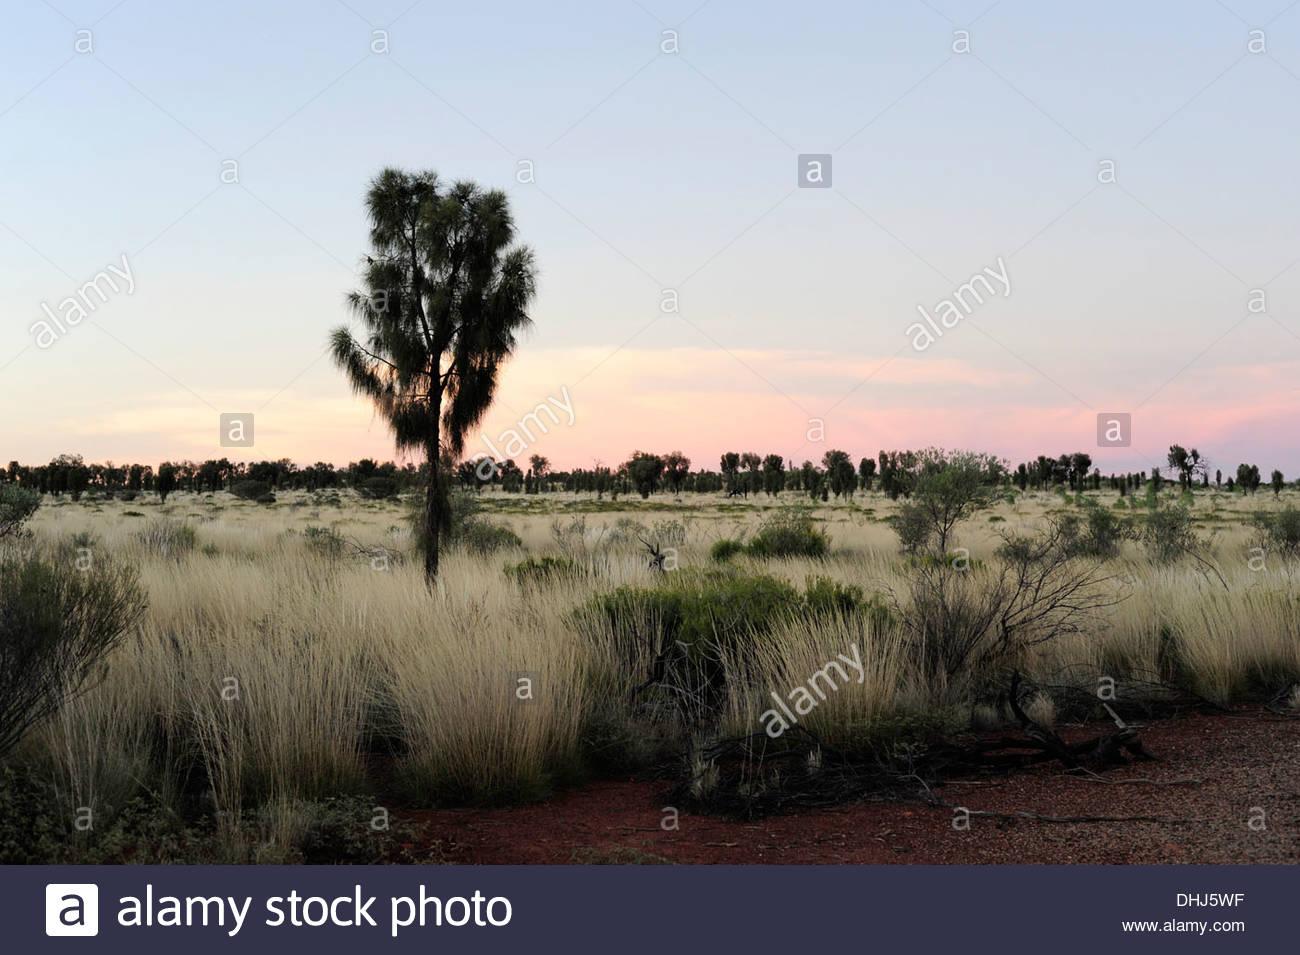 Tree in the Uluru Kata Tjuta National Park at dusk, Outback, Northern Territory, NT, Australia - Stock Image